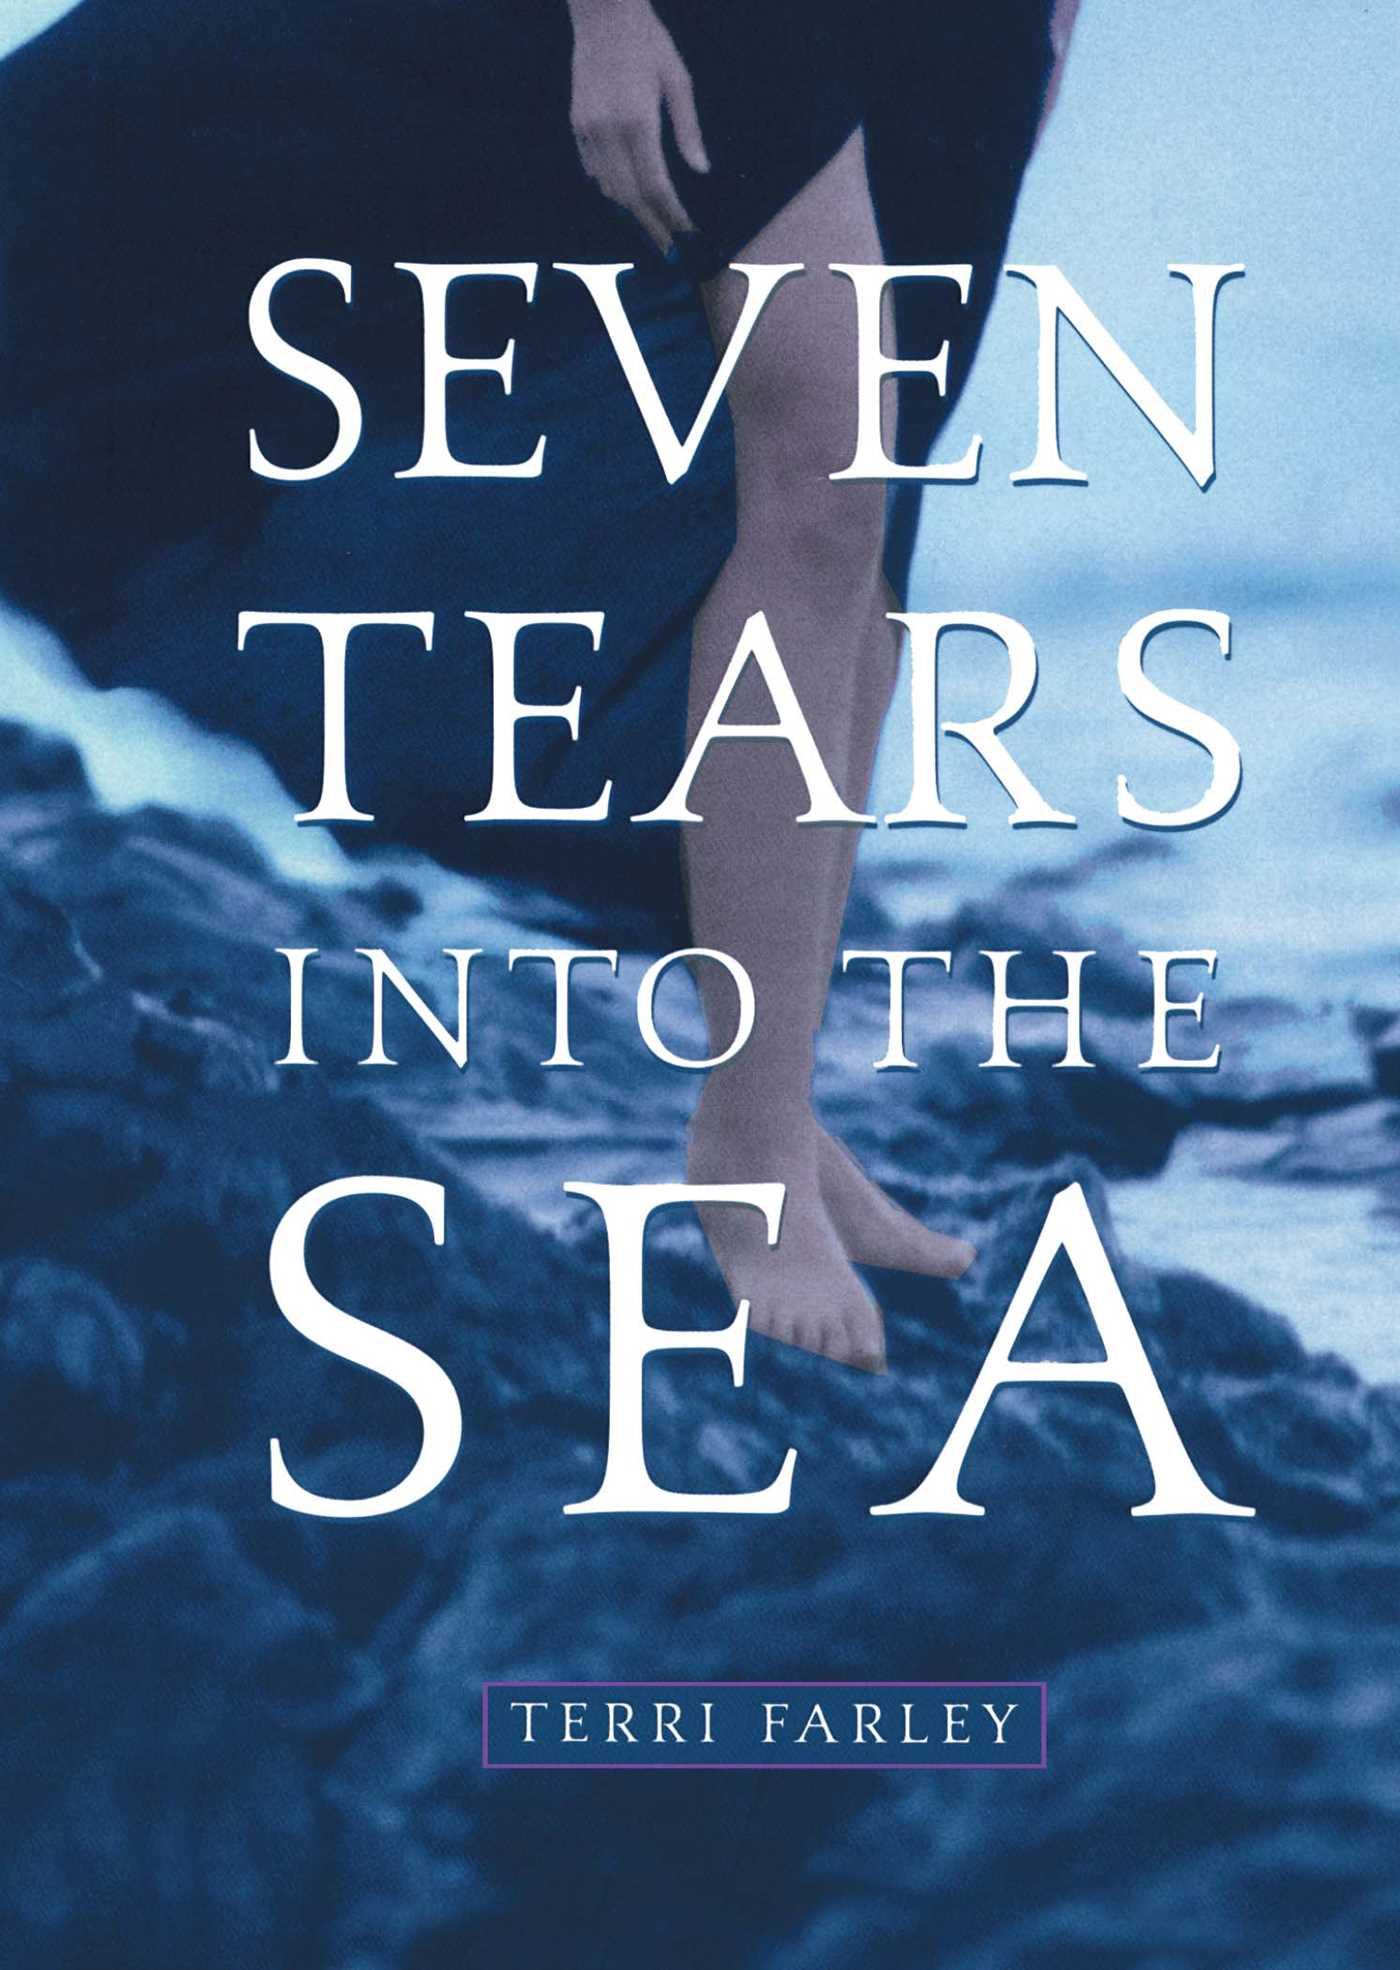 Seven tears into the sea 9780689864421 hr